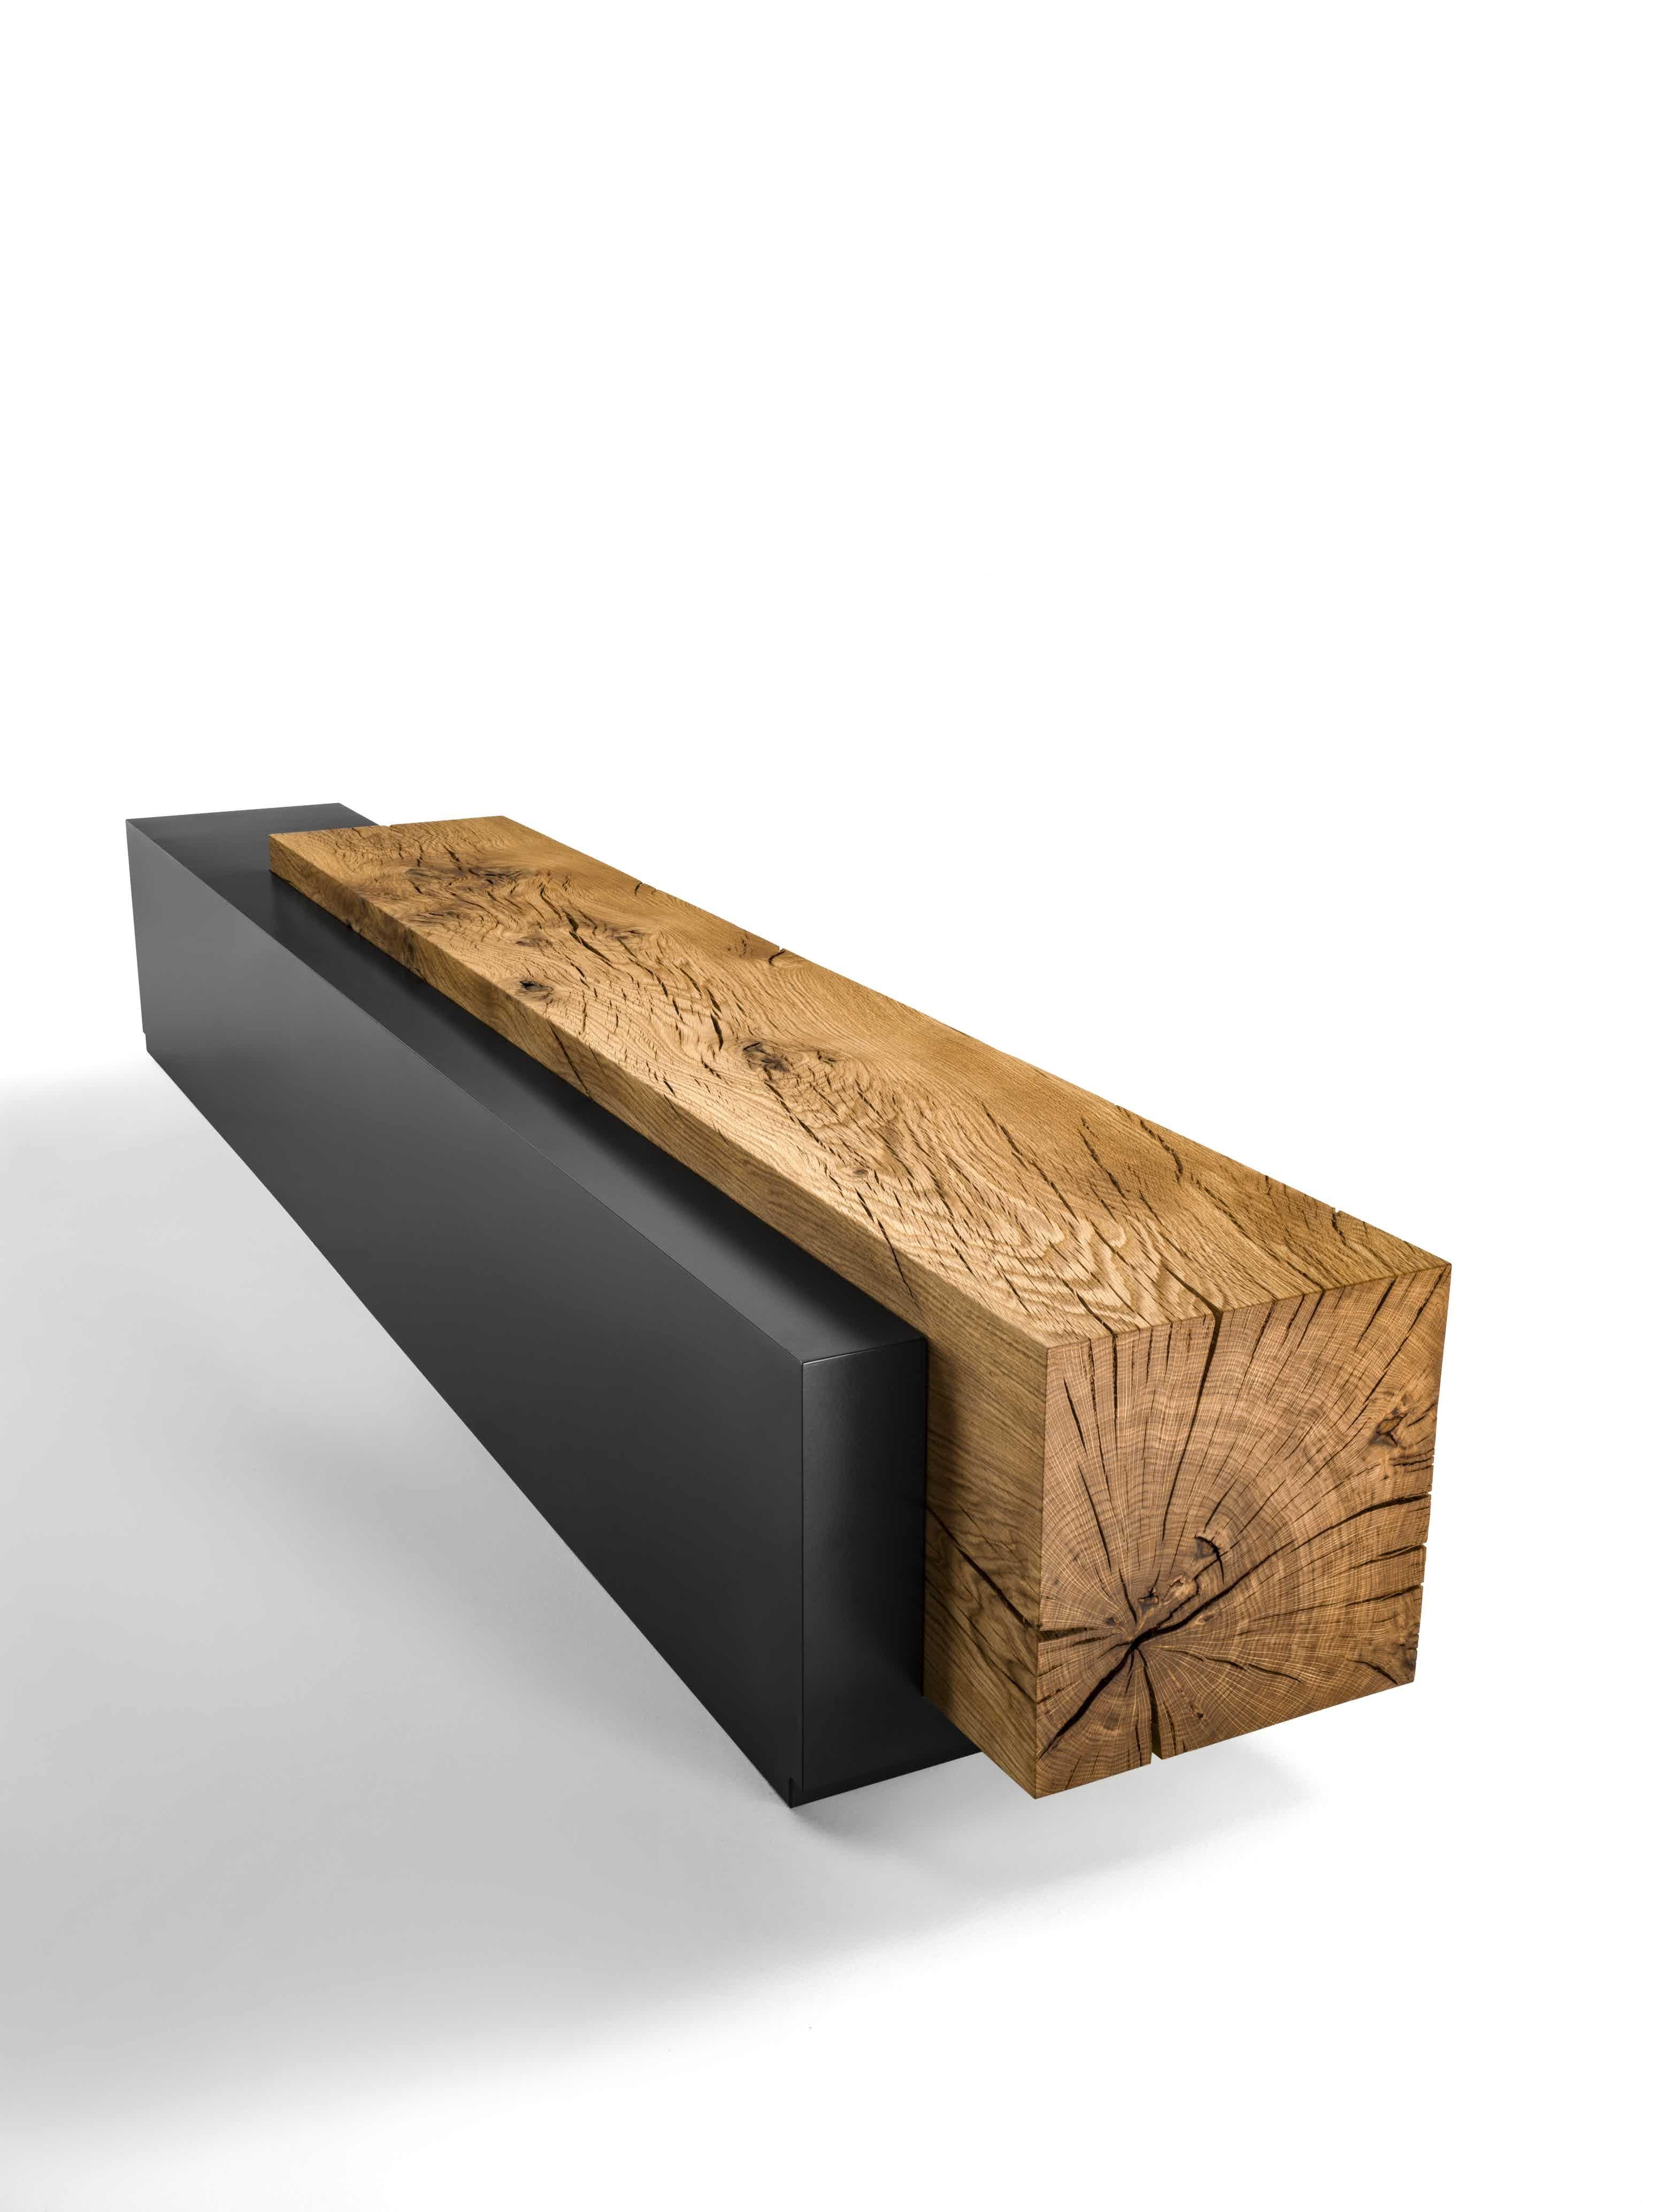 Riva 1920 Ombra Bench Side Haute Living Furniture Design Modern Contemporary Furniture Design Interior Design Blog [ 4136 x 3100 Pixel ]